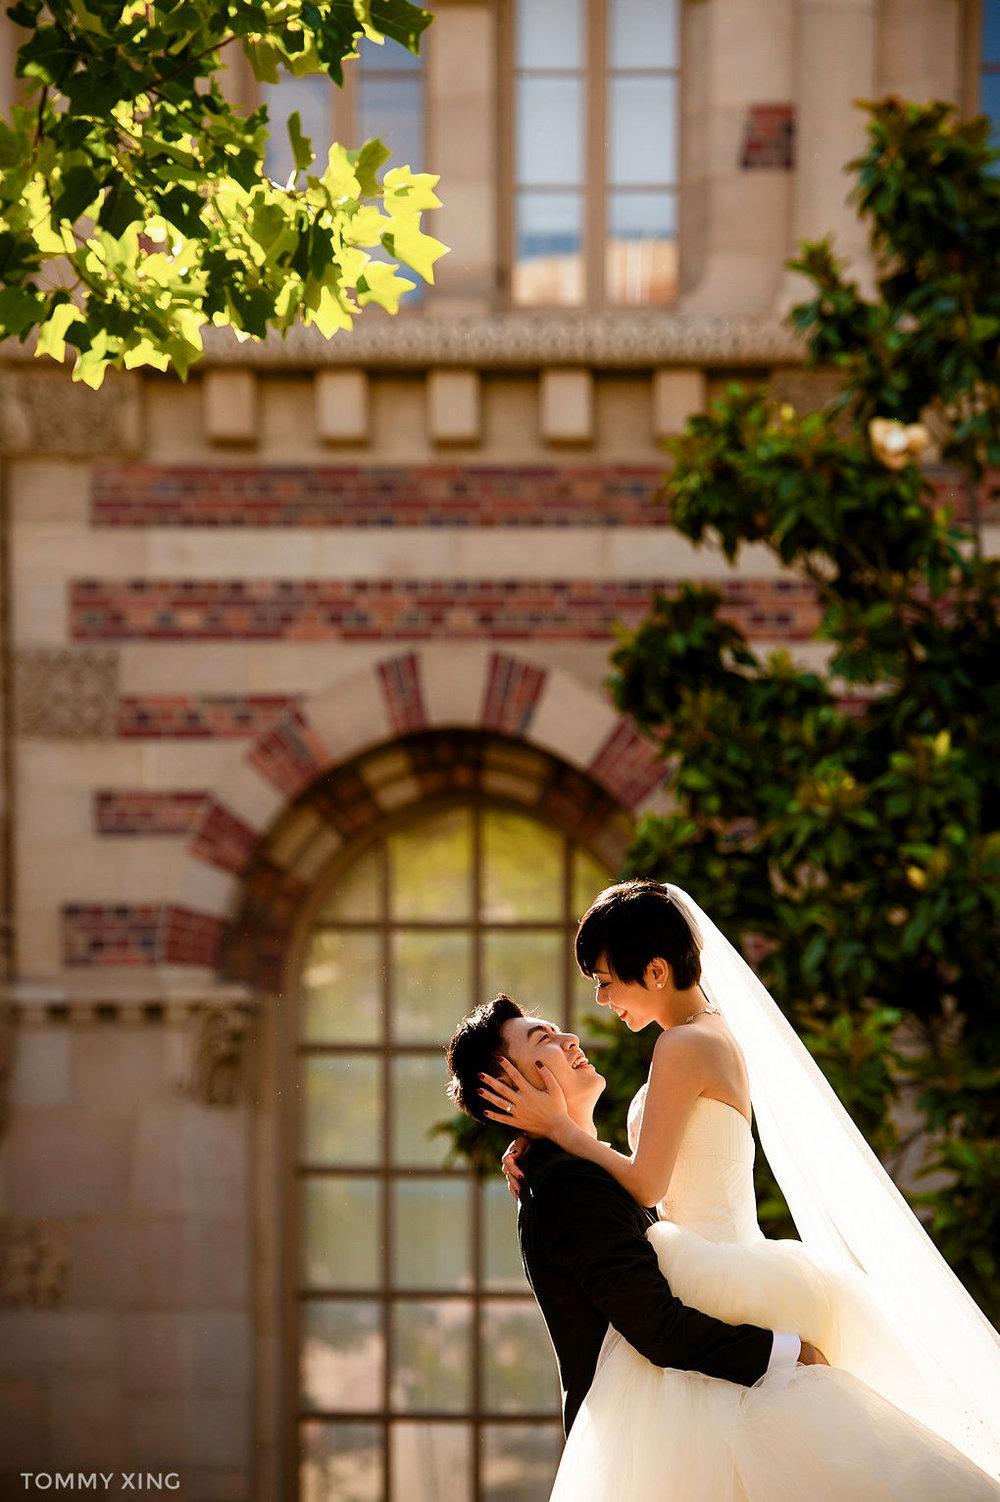 洛杉矶婚纱照 - Los Angeles Pre Wedding - Tommy Xing14.jpg